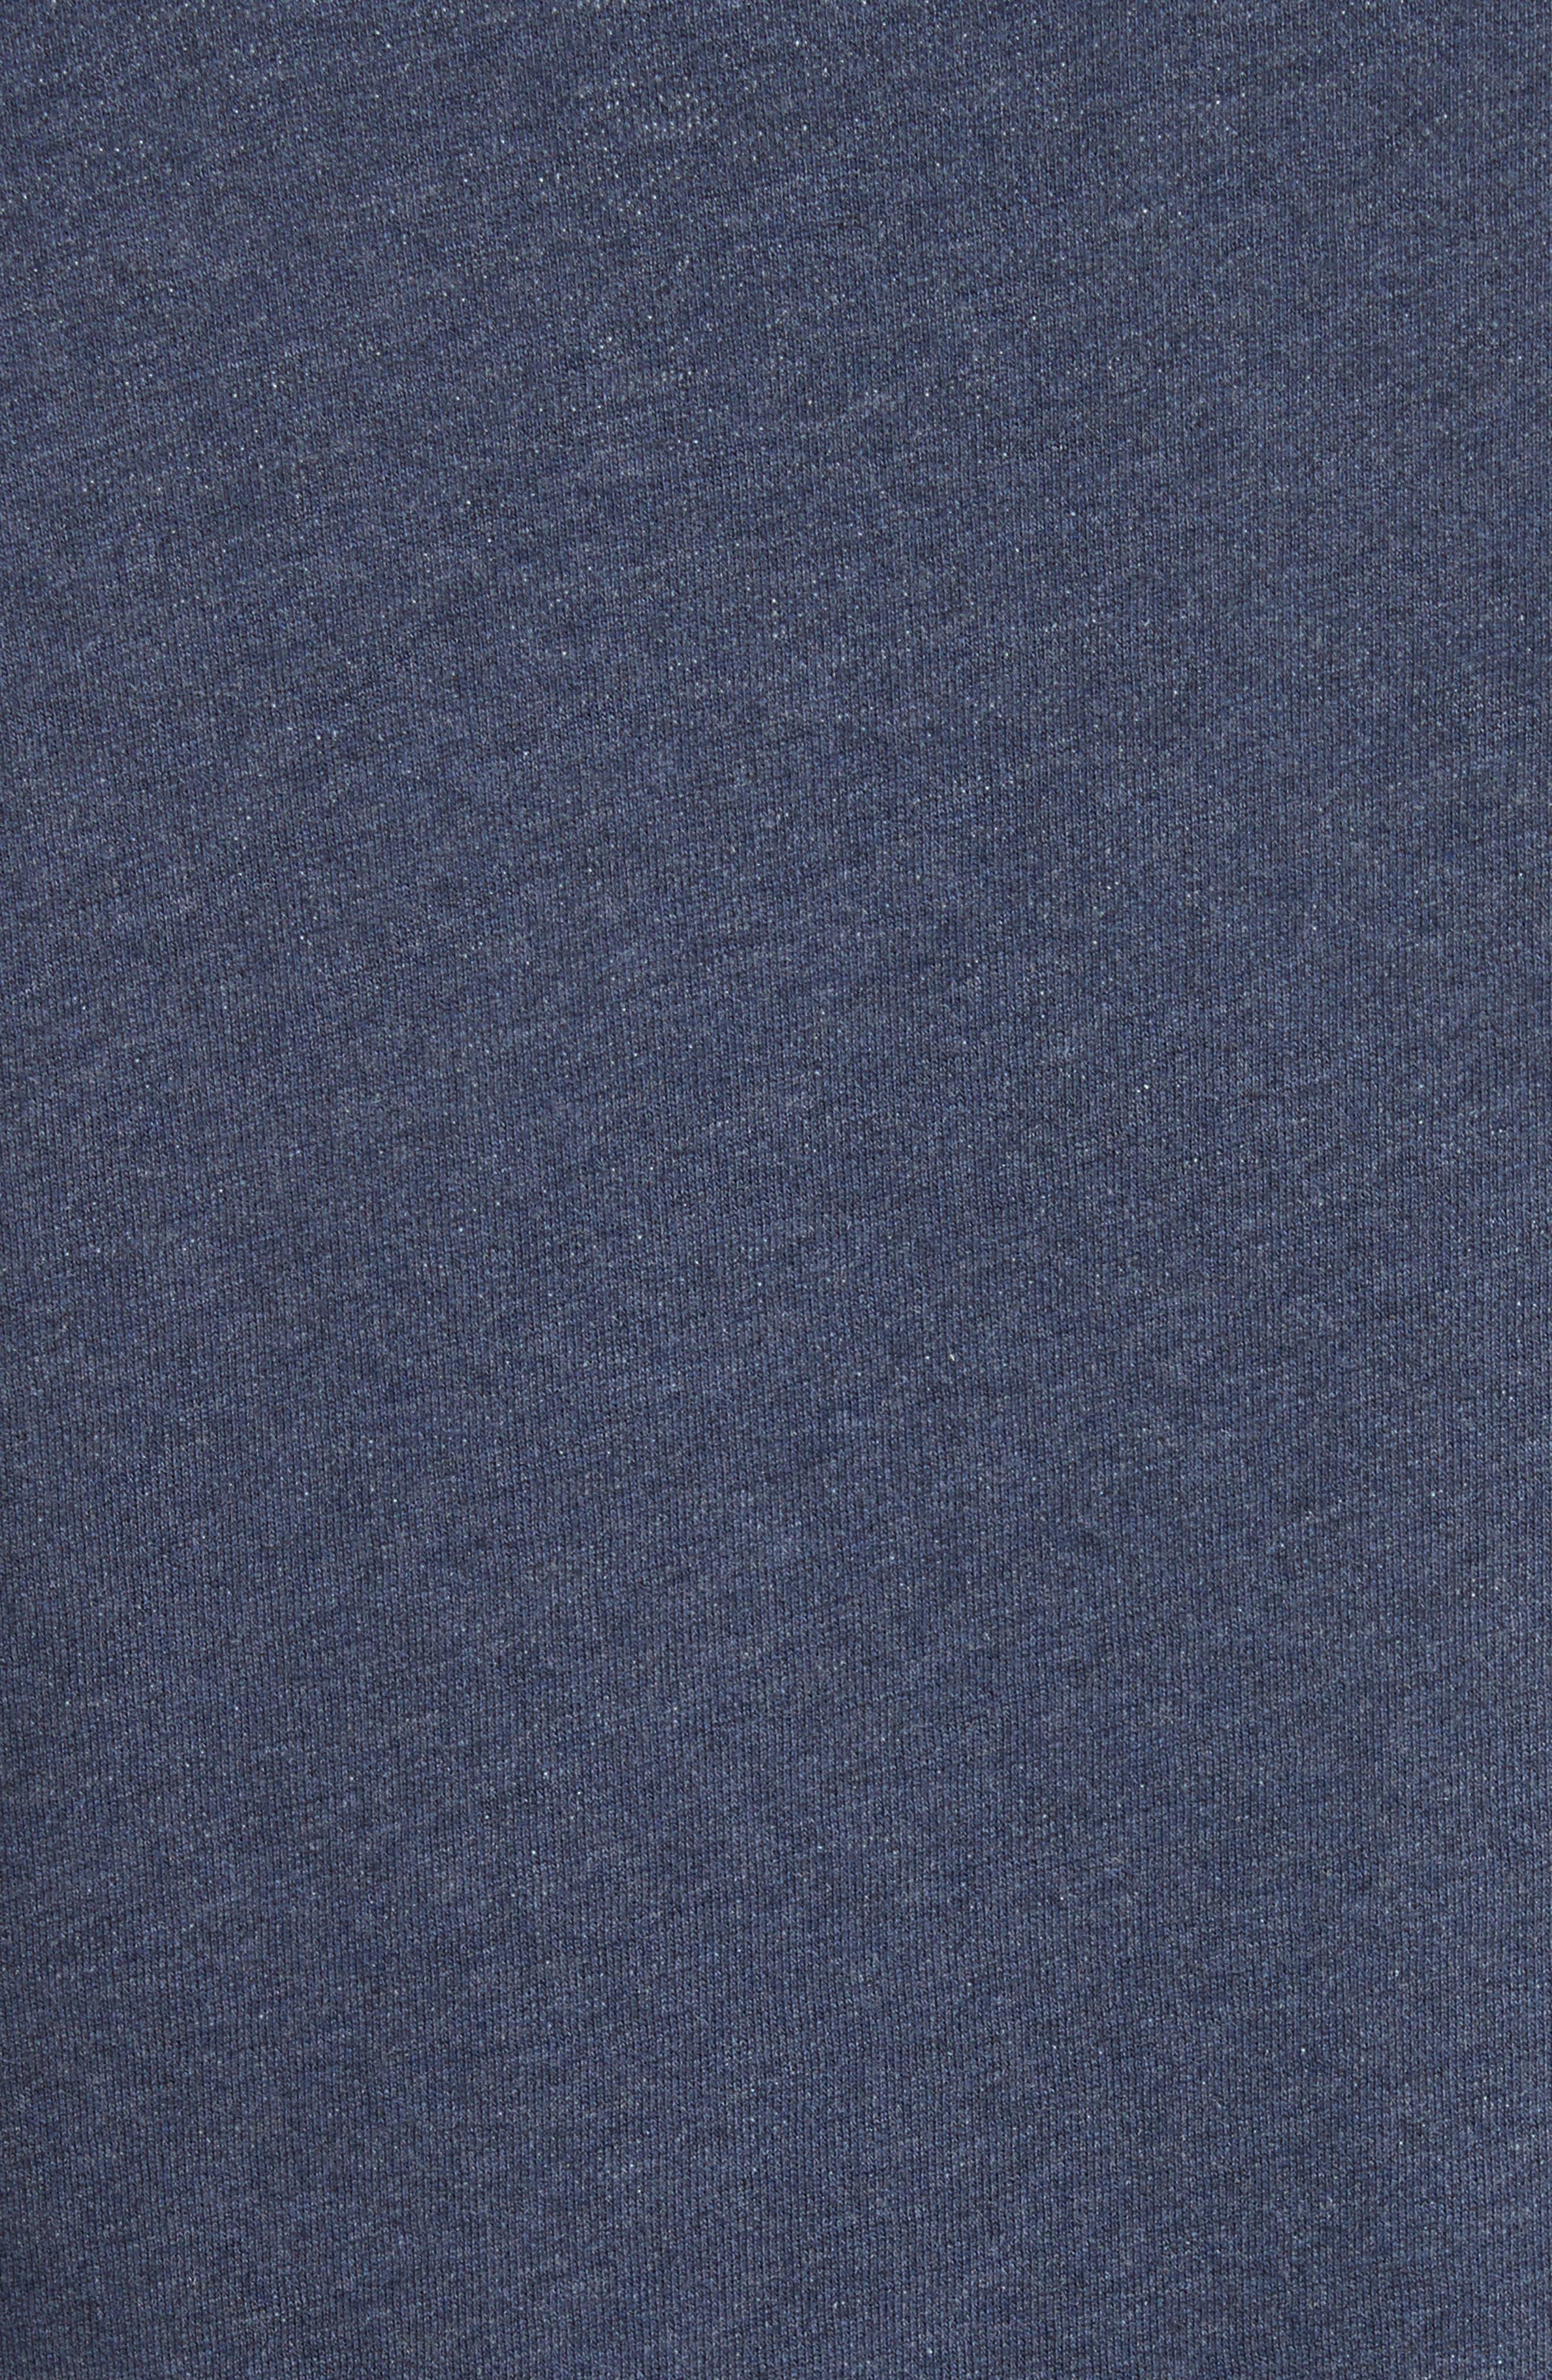 Standard Issue Crewneck Sweatshirt,                             Alternate thumbnail 15, color,